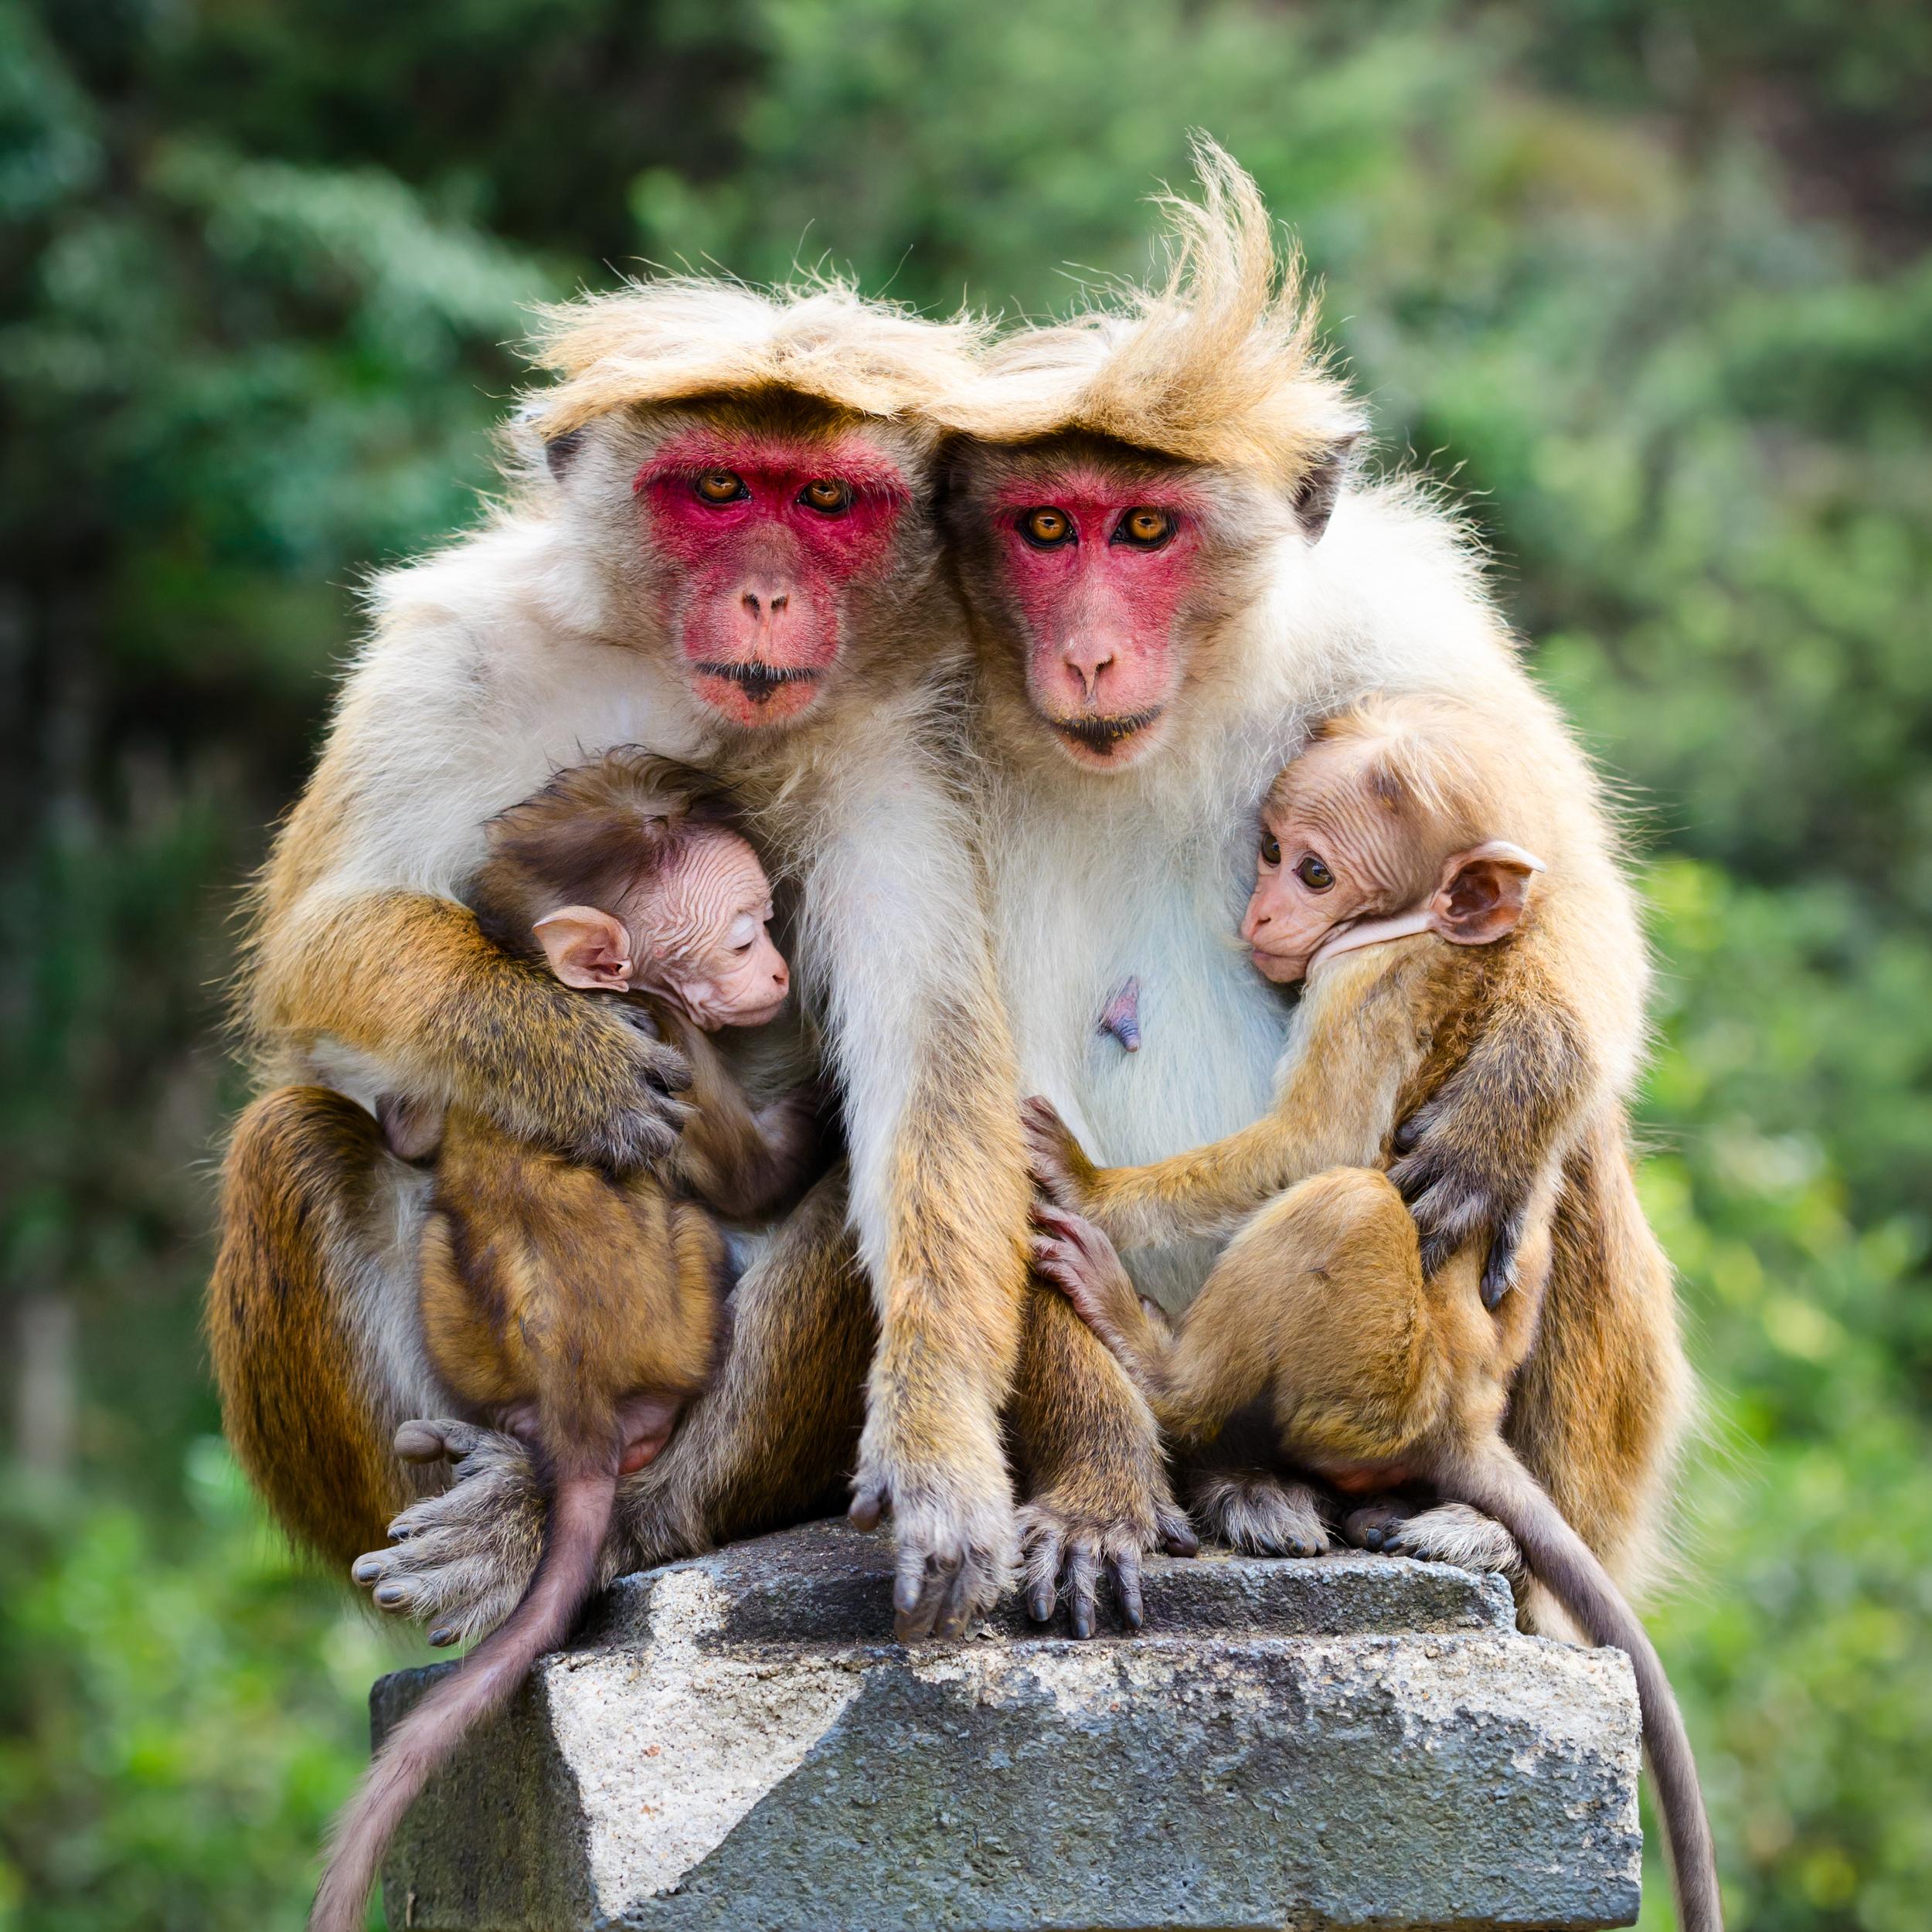 invite-to-paradise-sri-lanka-holiday-honeymoon-cultural-triangle-dambulla-cave-temple-view-monkeys-3.jpg